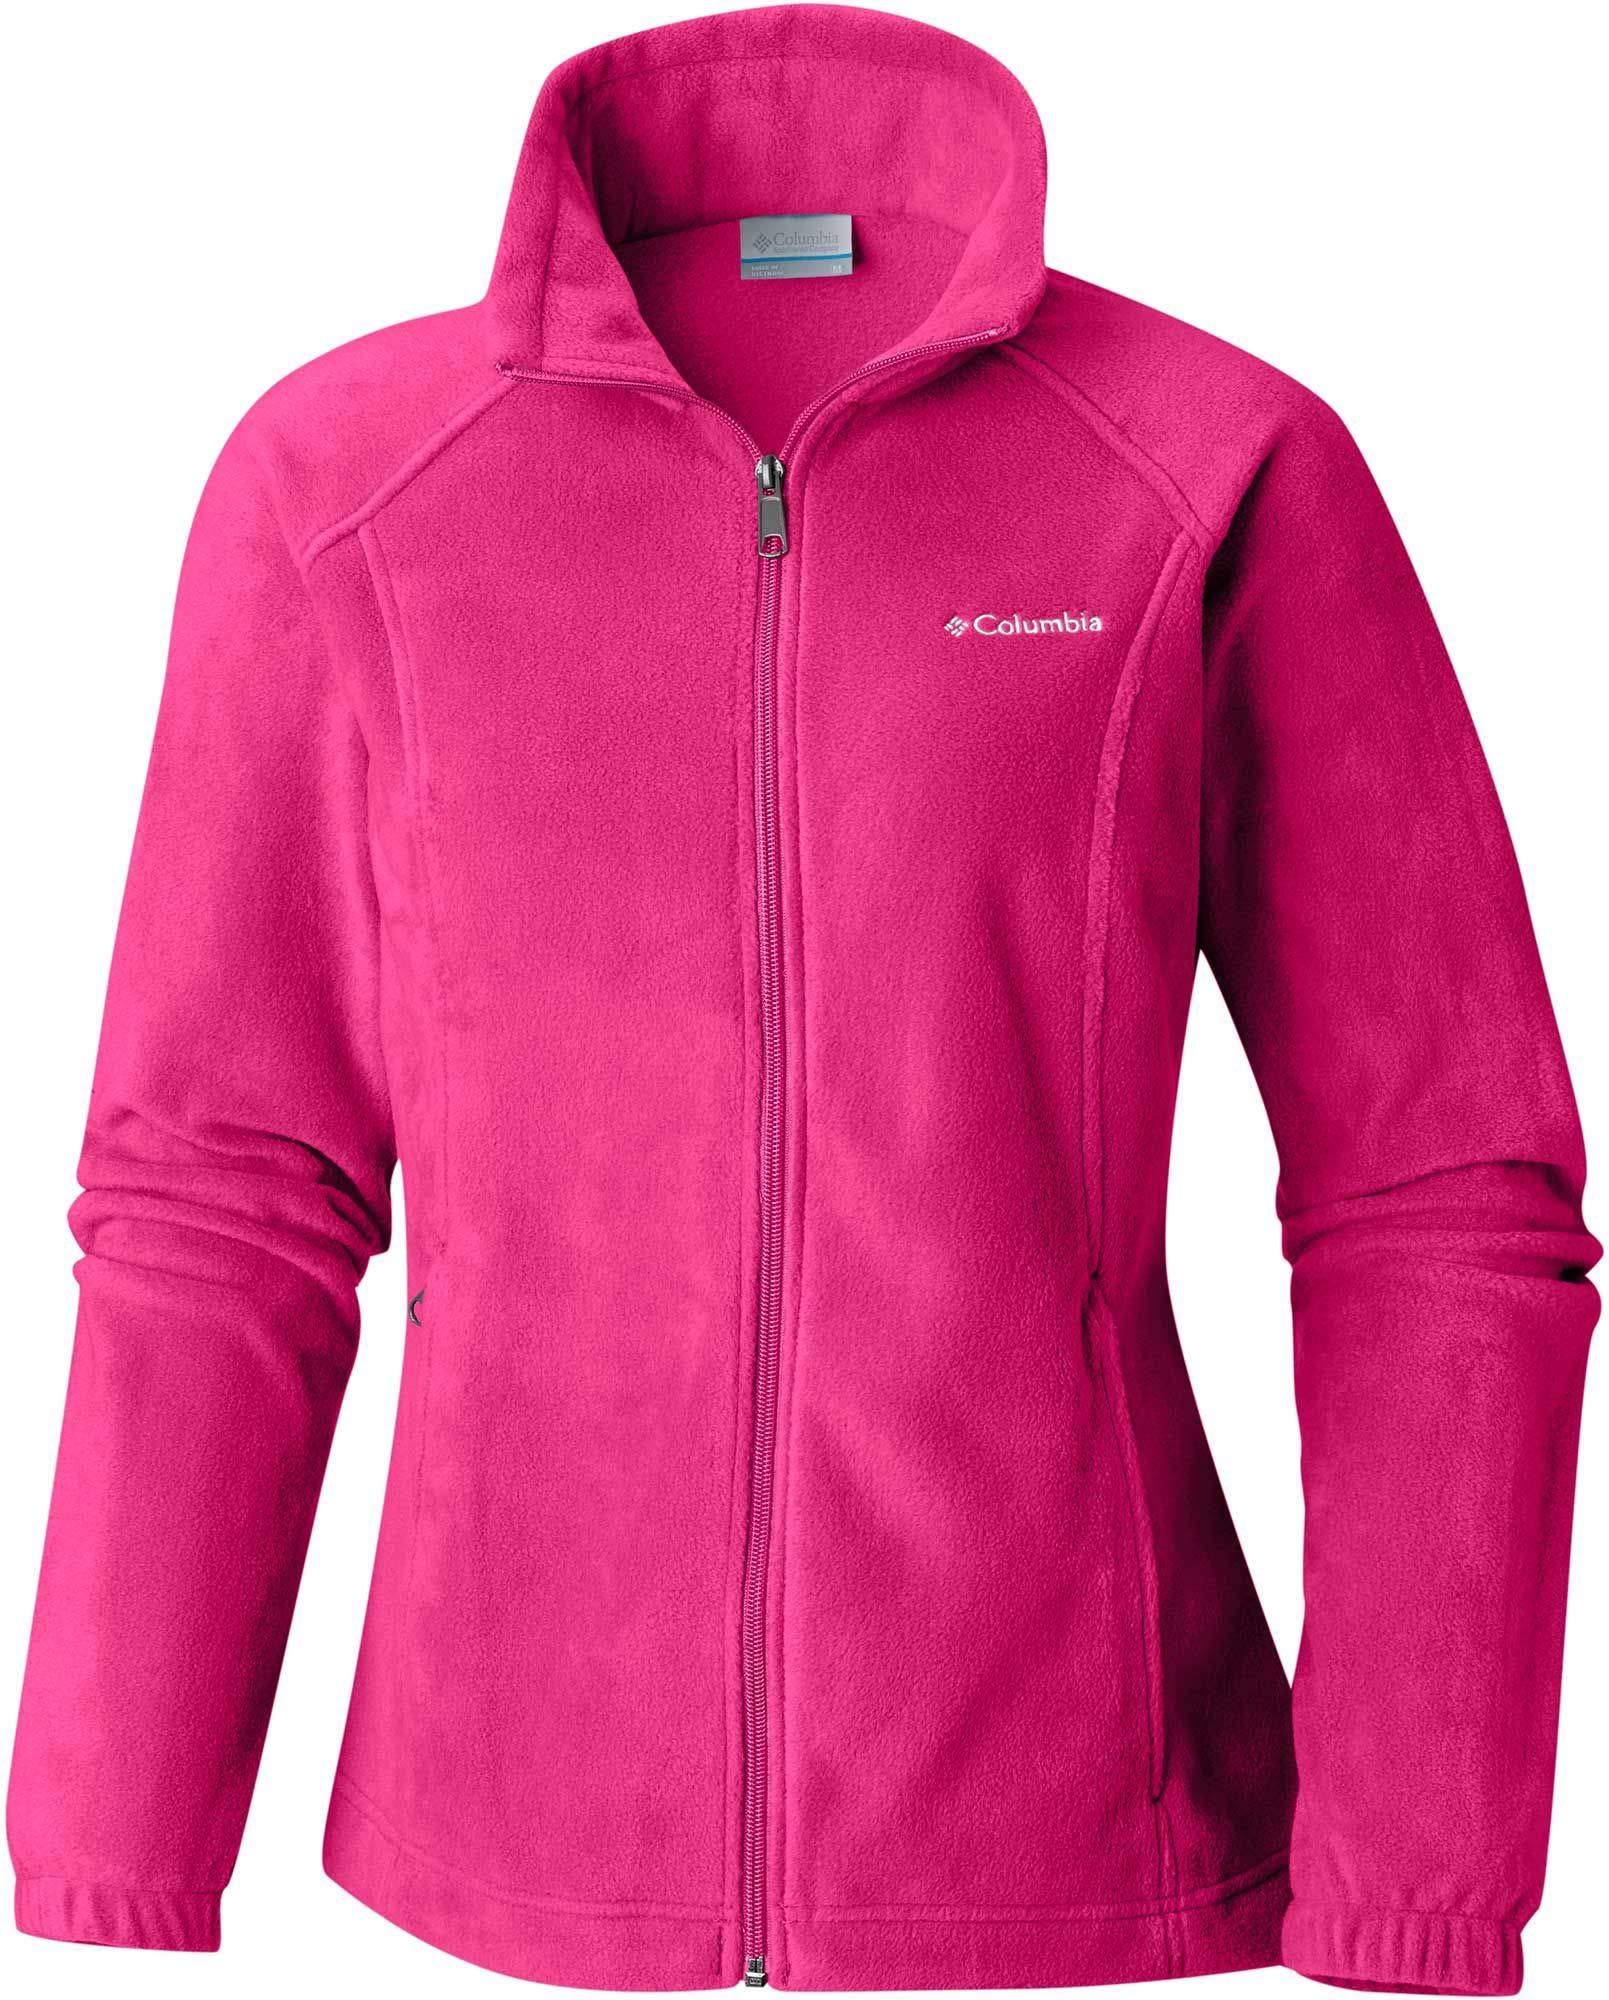 Columbia Women's Benton Springs Classic Fit Full Zip Soft Fleece Jacket, Cactus Pink X-Small